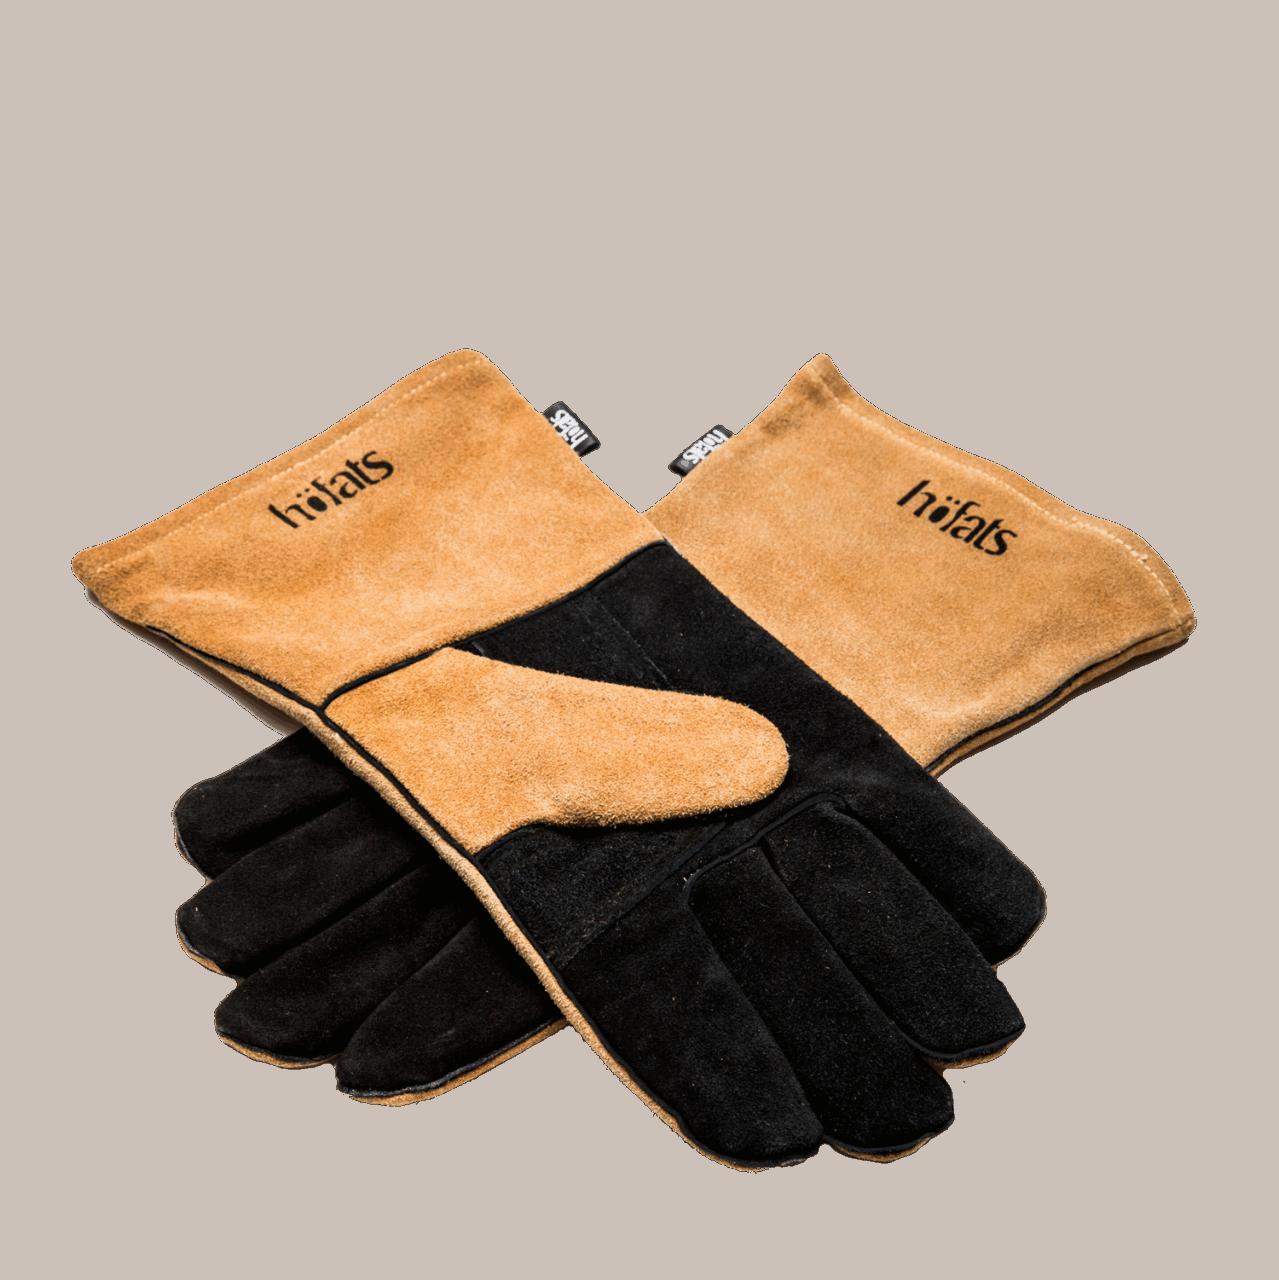 TOOLS Handschuh